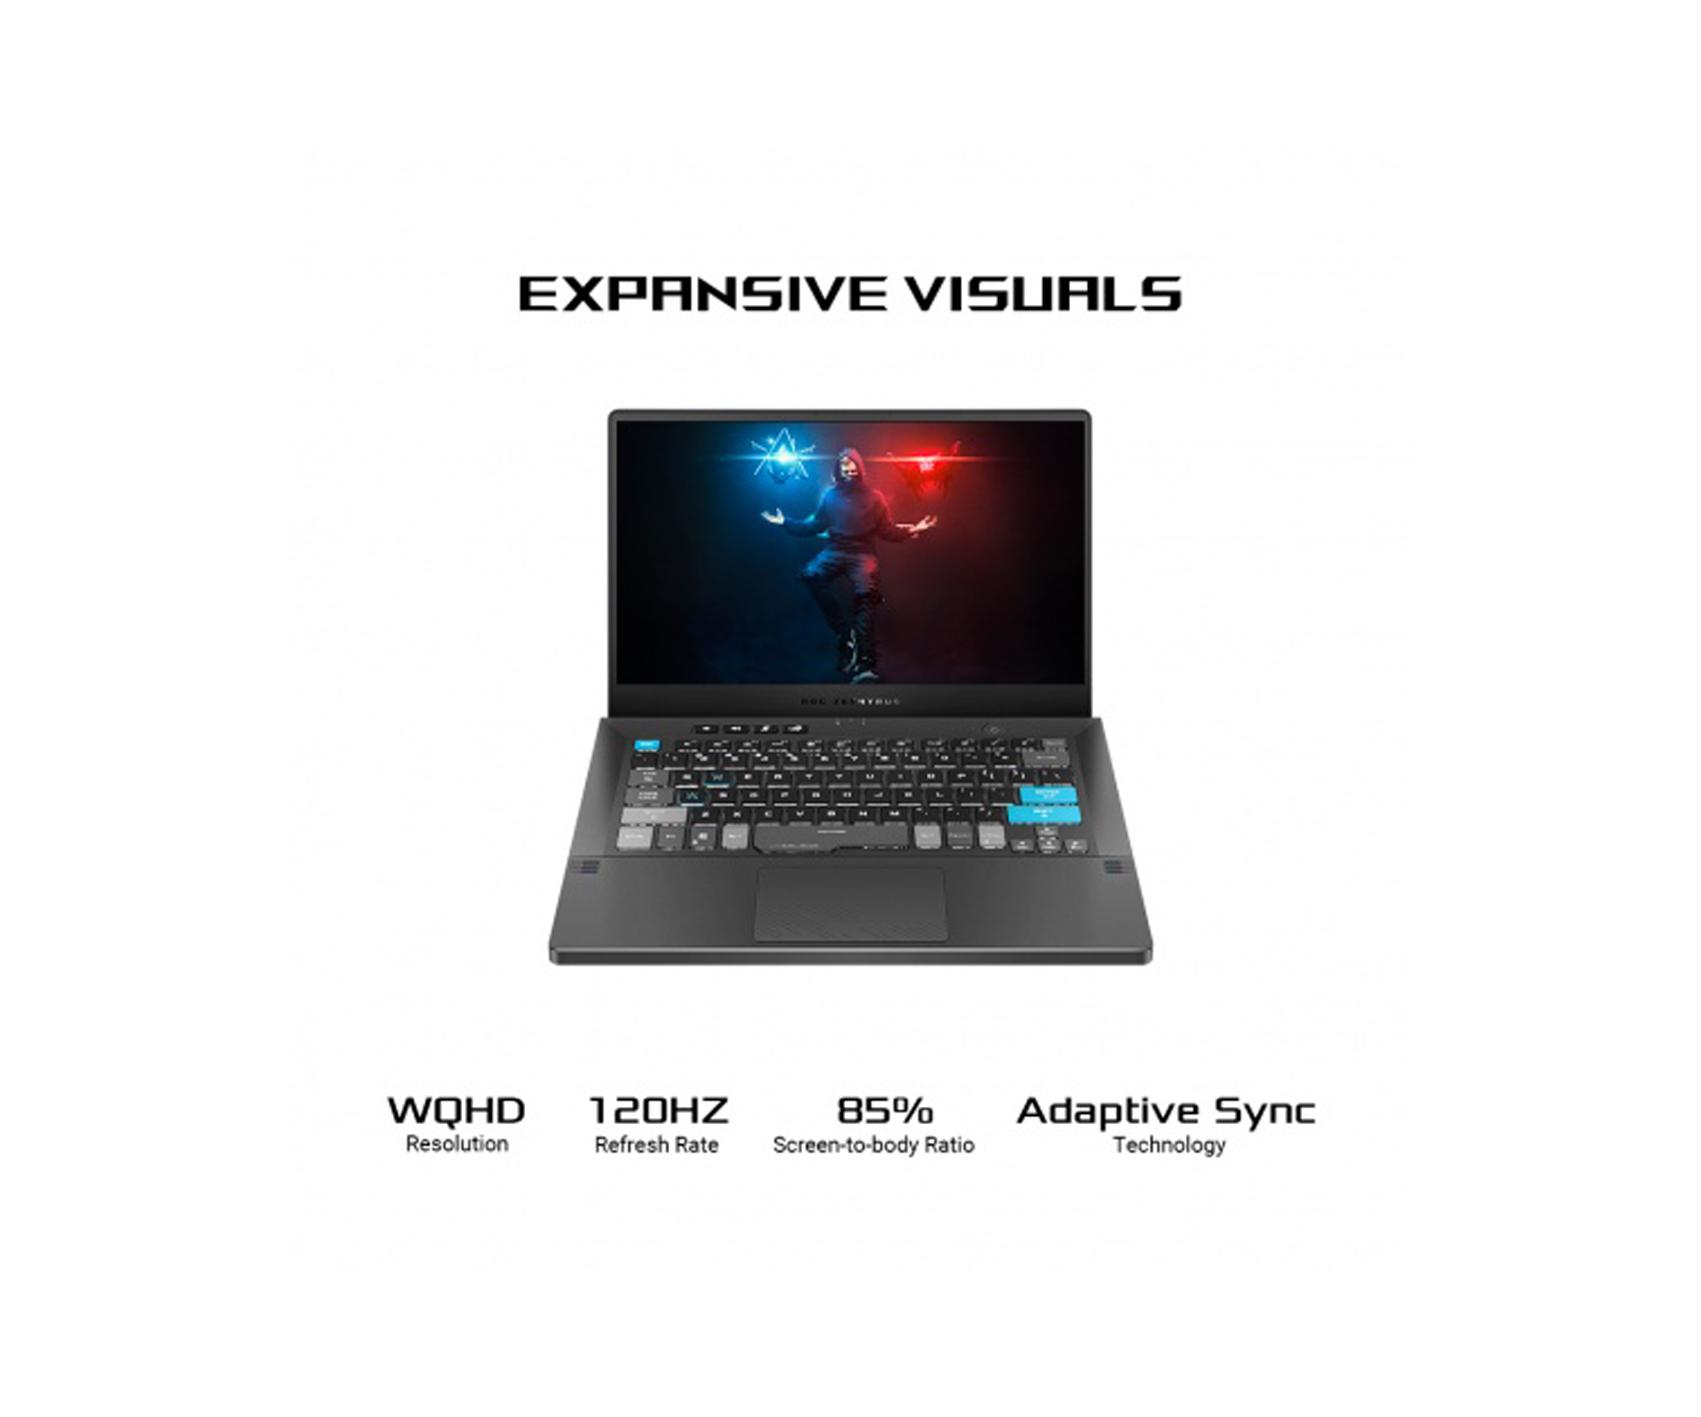 "ASUS ROG Zephyrus G14 Alan Walker Special Edition Gaming Laptop, 14"" 120Hz PANTONE Validated WQHD Display, GeForce RTX 3050 Ti, AMD Ryzen 9 5900HS, 16GB DDR4, 1TB SSD, Wi-Fi 6, GA401QEC-K2064T"